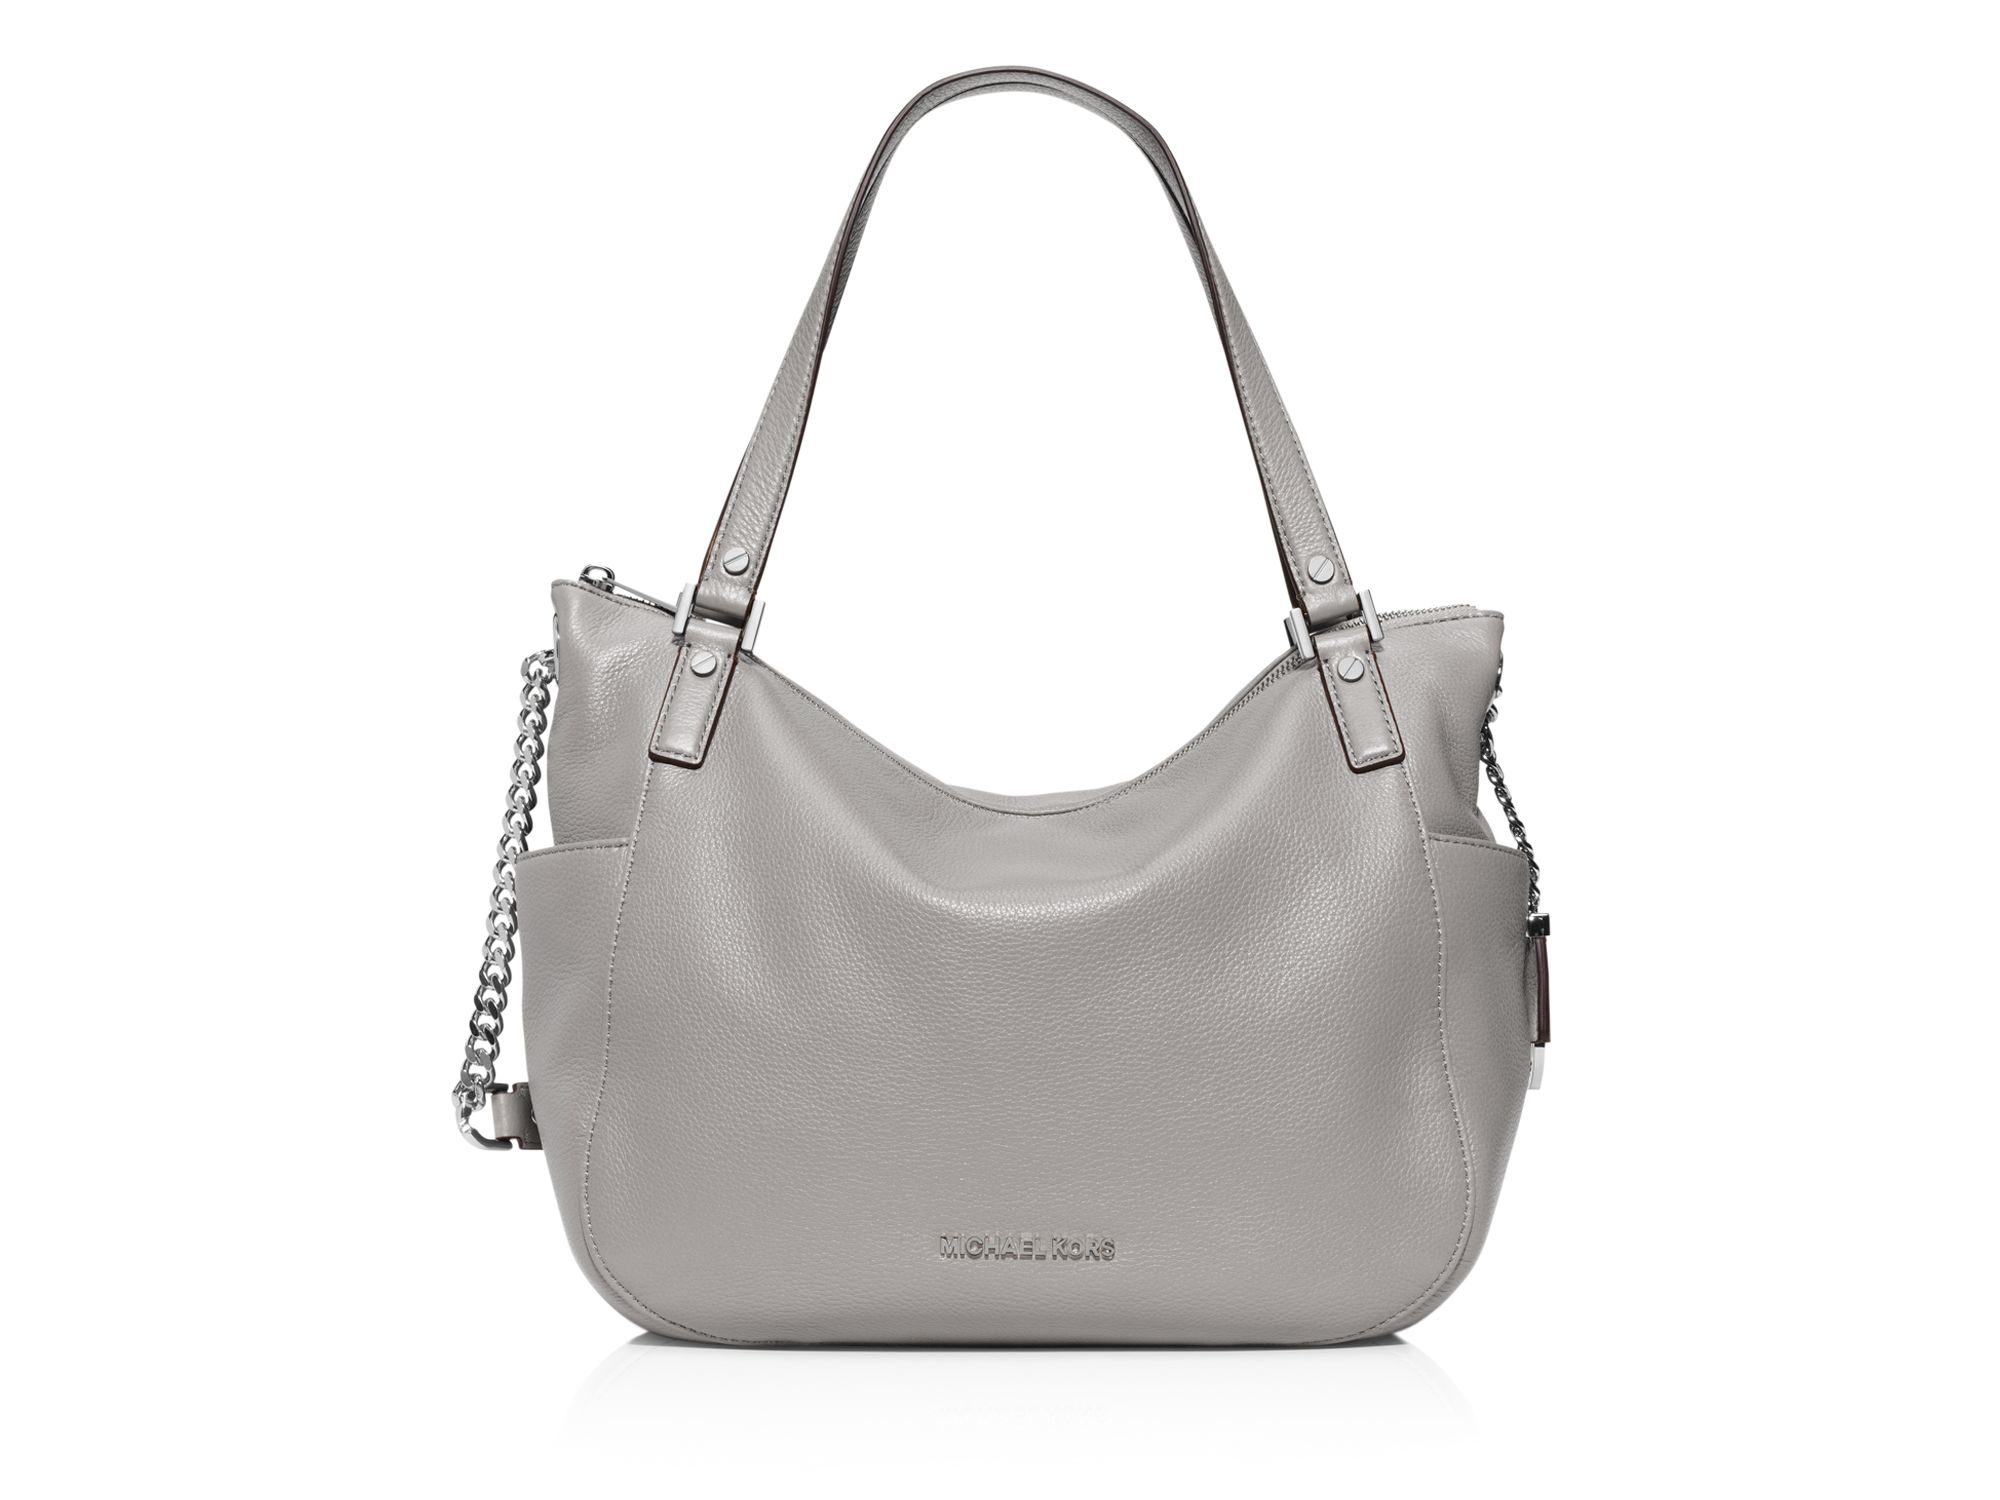 e0c12ab87311 Lyst - MICHAEL Michael Kors Chandler Large Shoulder Bag in Gray